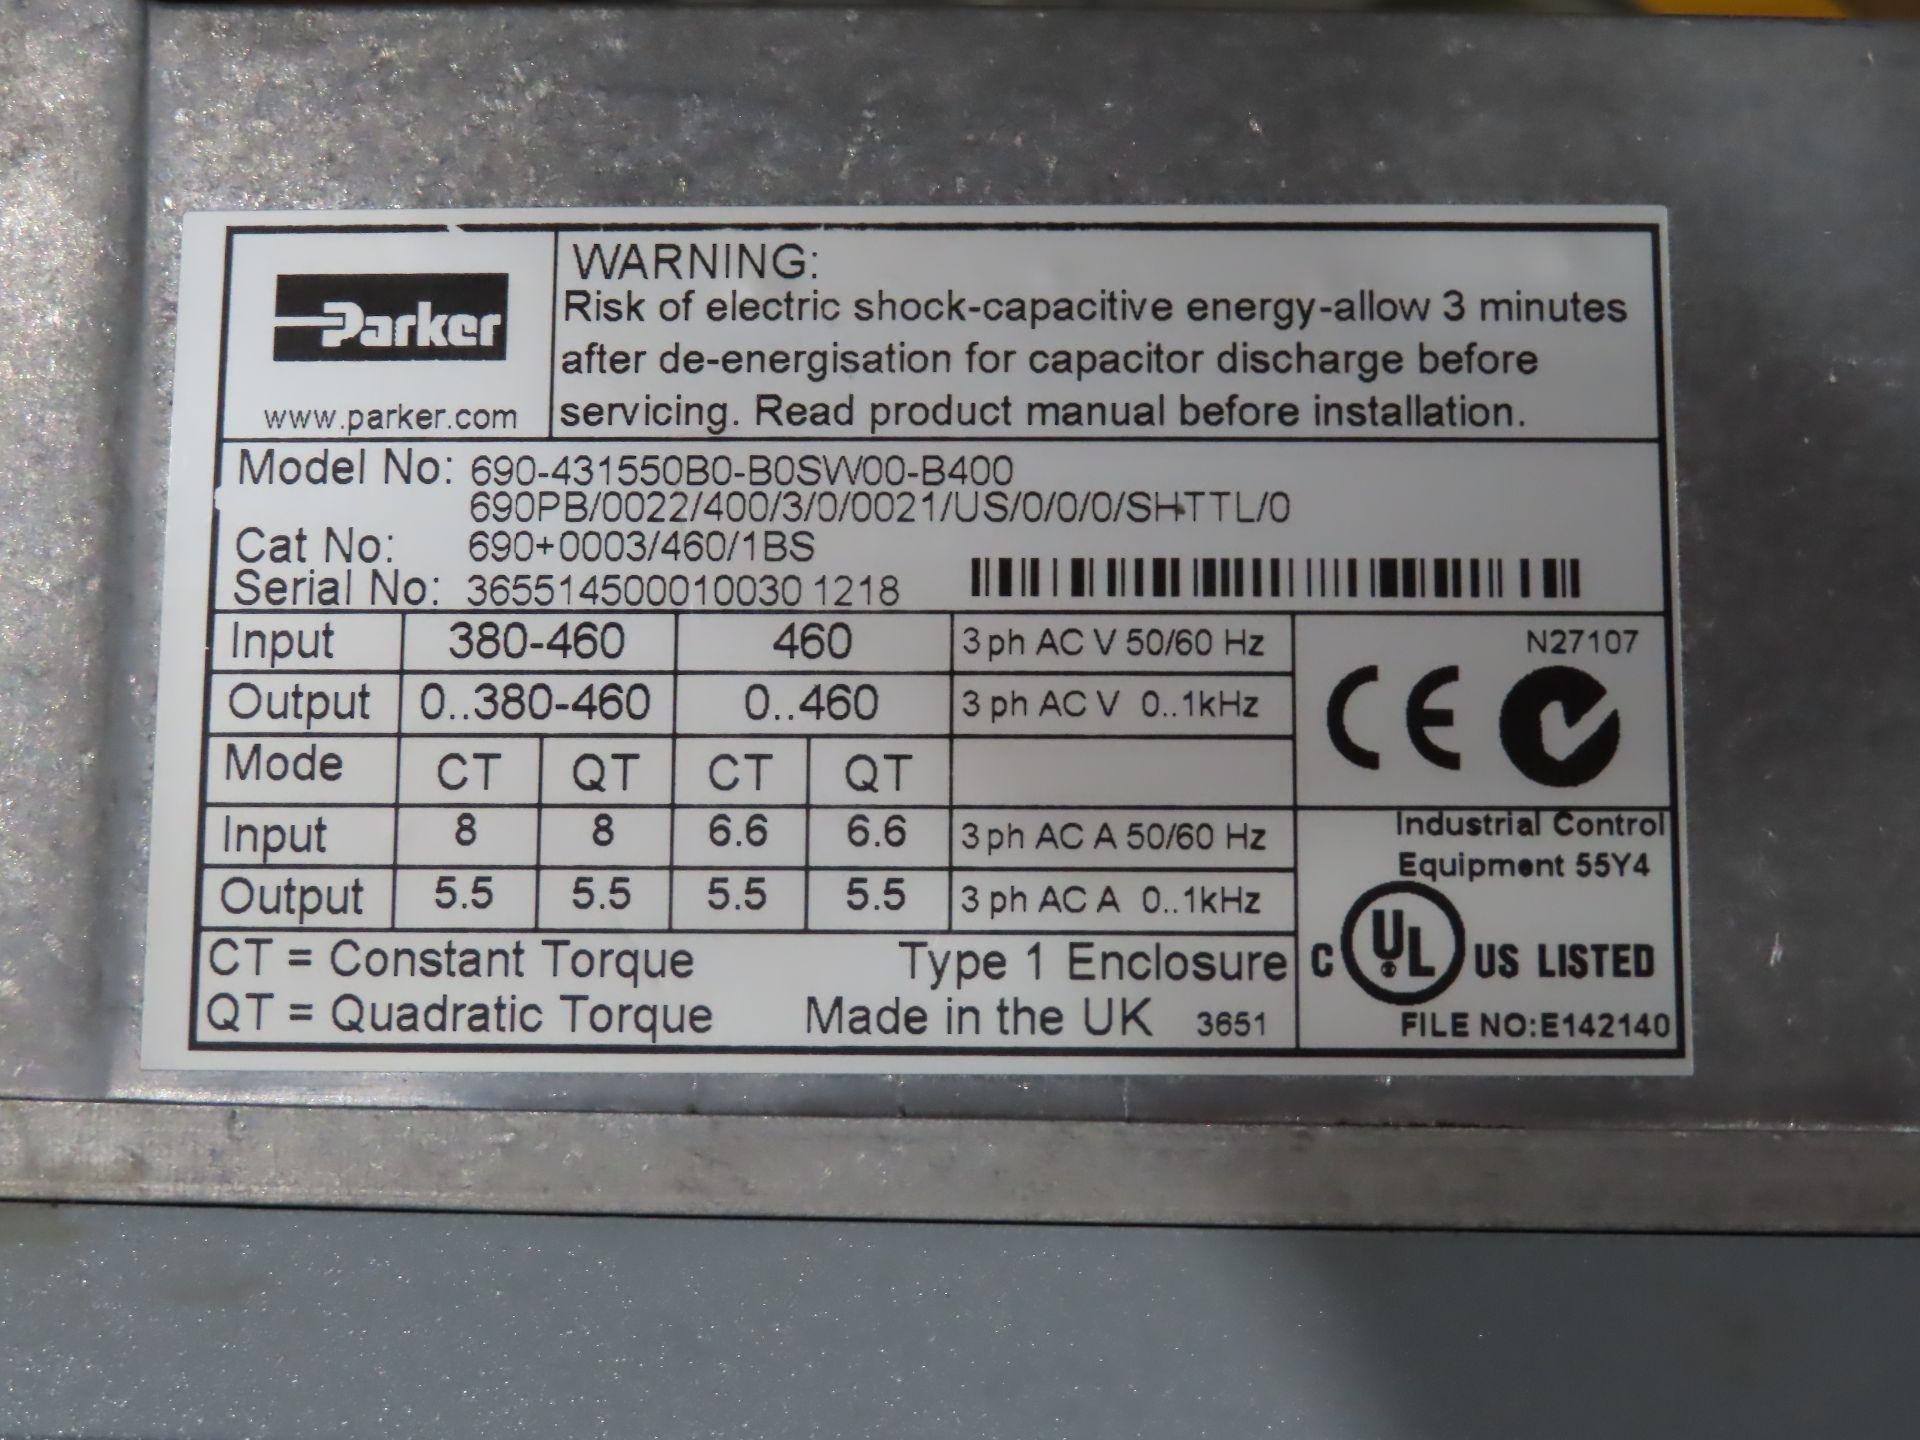 Lot 2 - Parker drive model 690-431550B0-B0SW00-B00, catalog 690+0003/460/1BS, as always, with Brolyn LLC